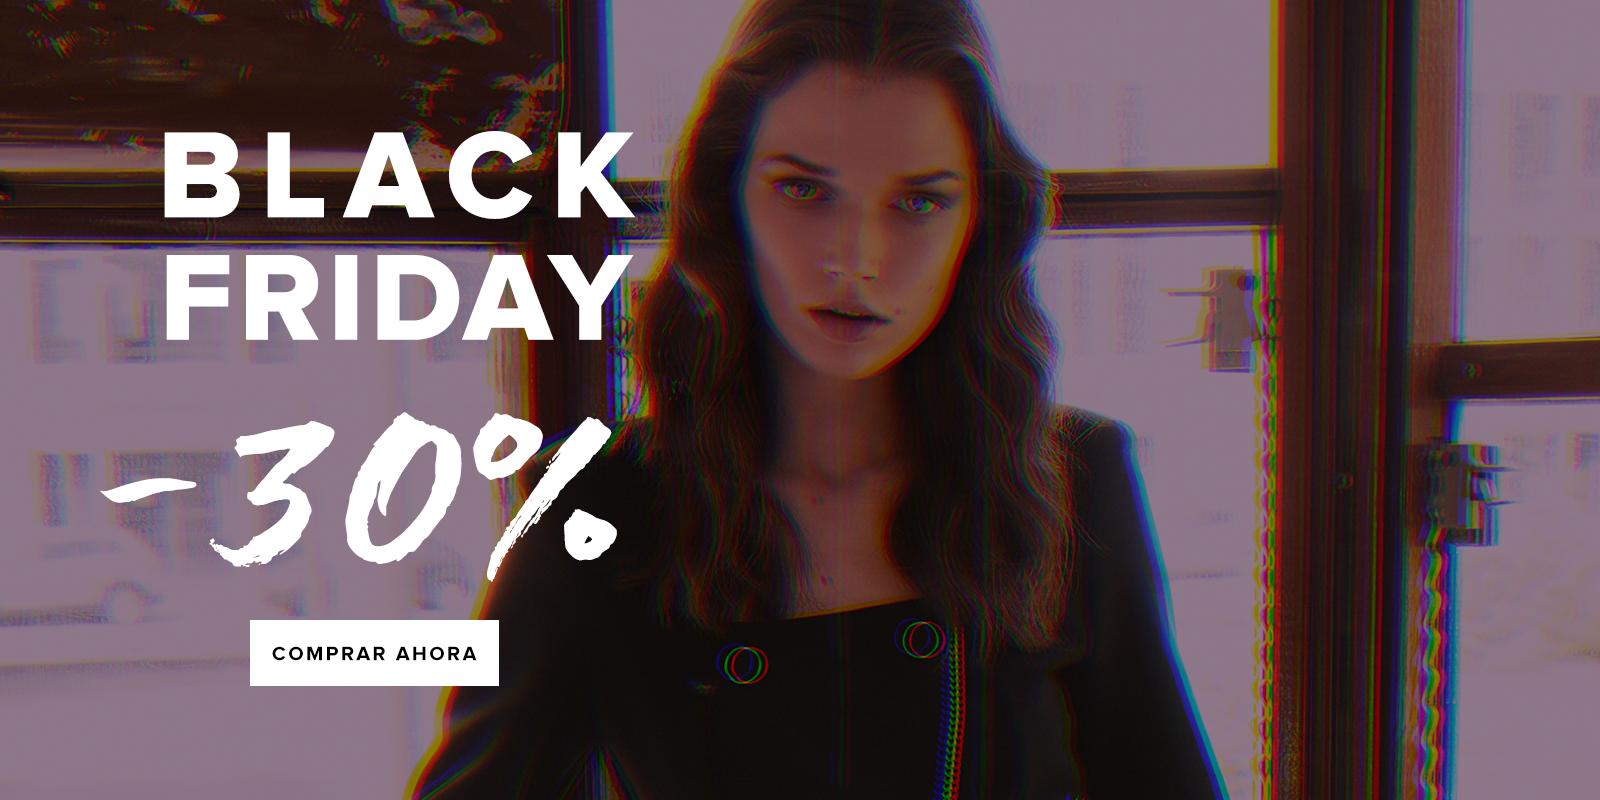 Motivi - Black Friday